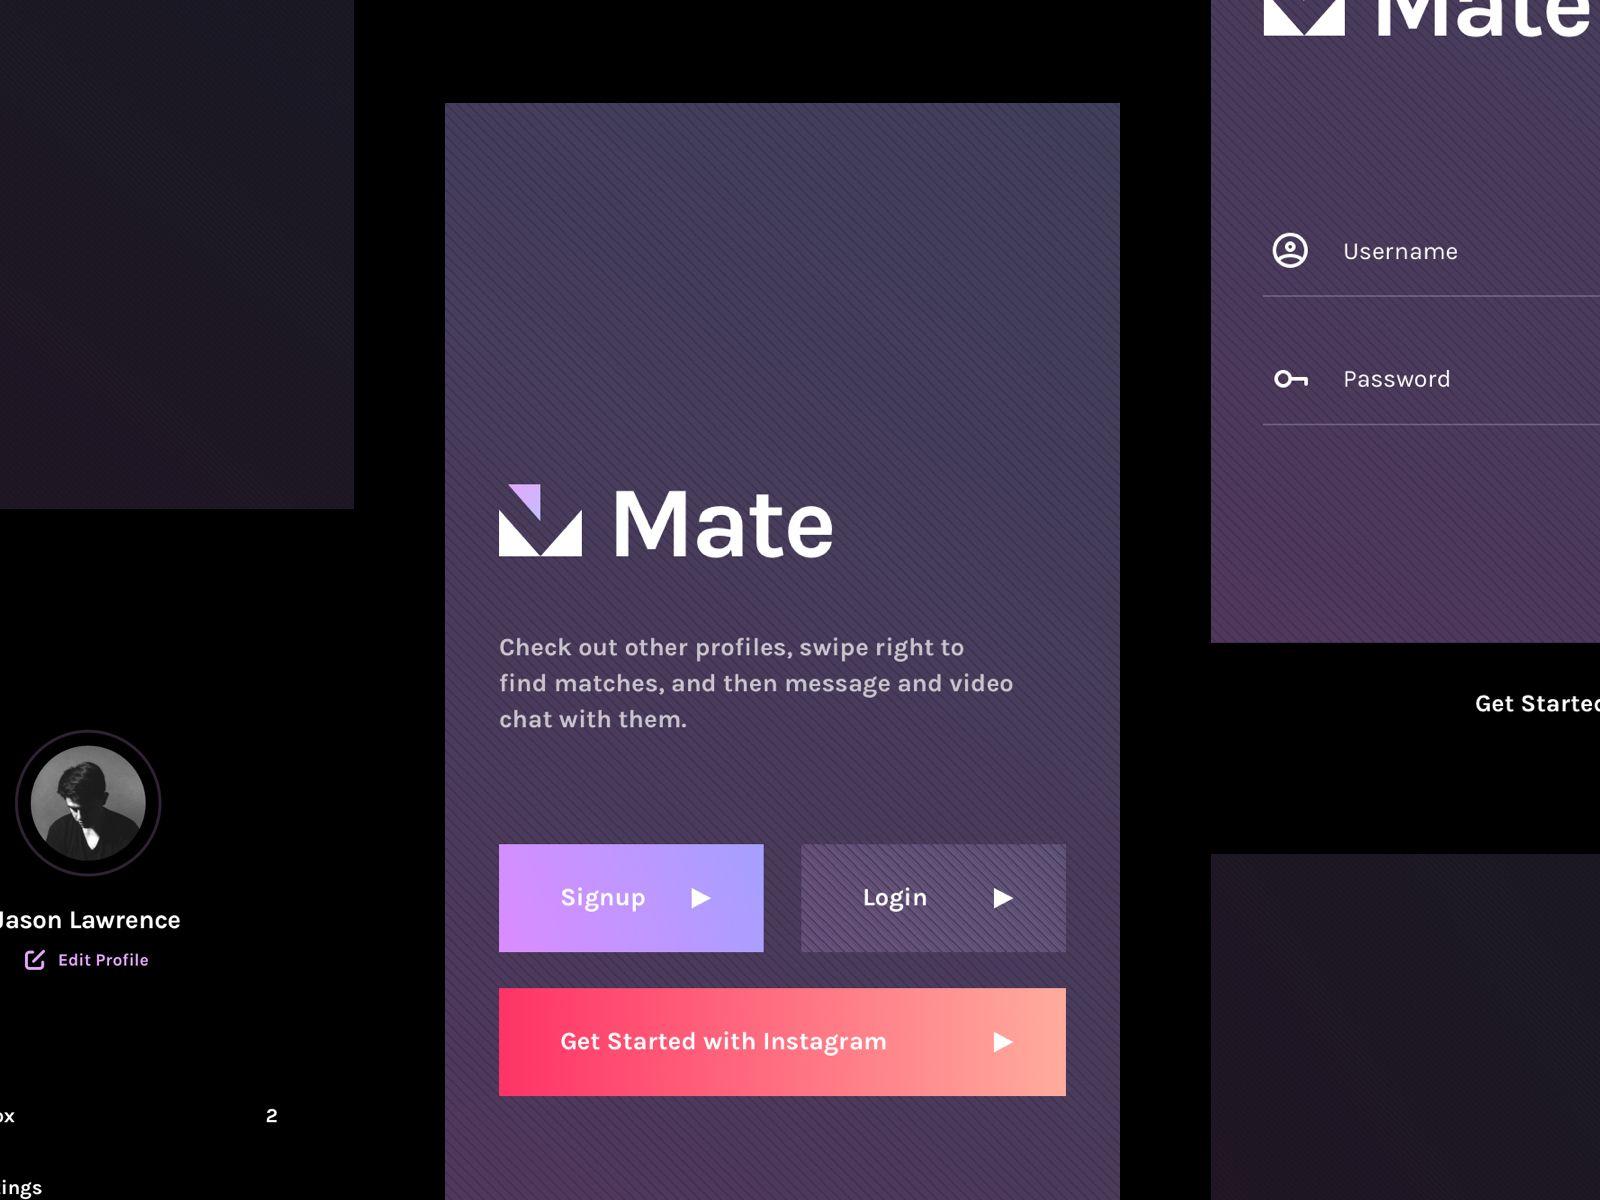 Mate Dating Application Dating application, Flirting